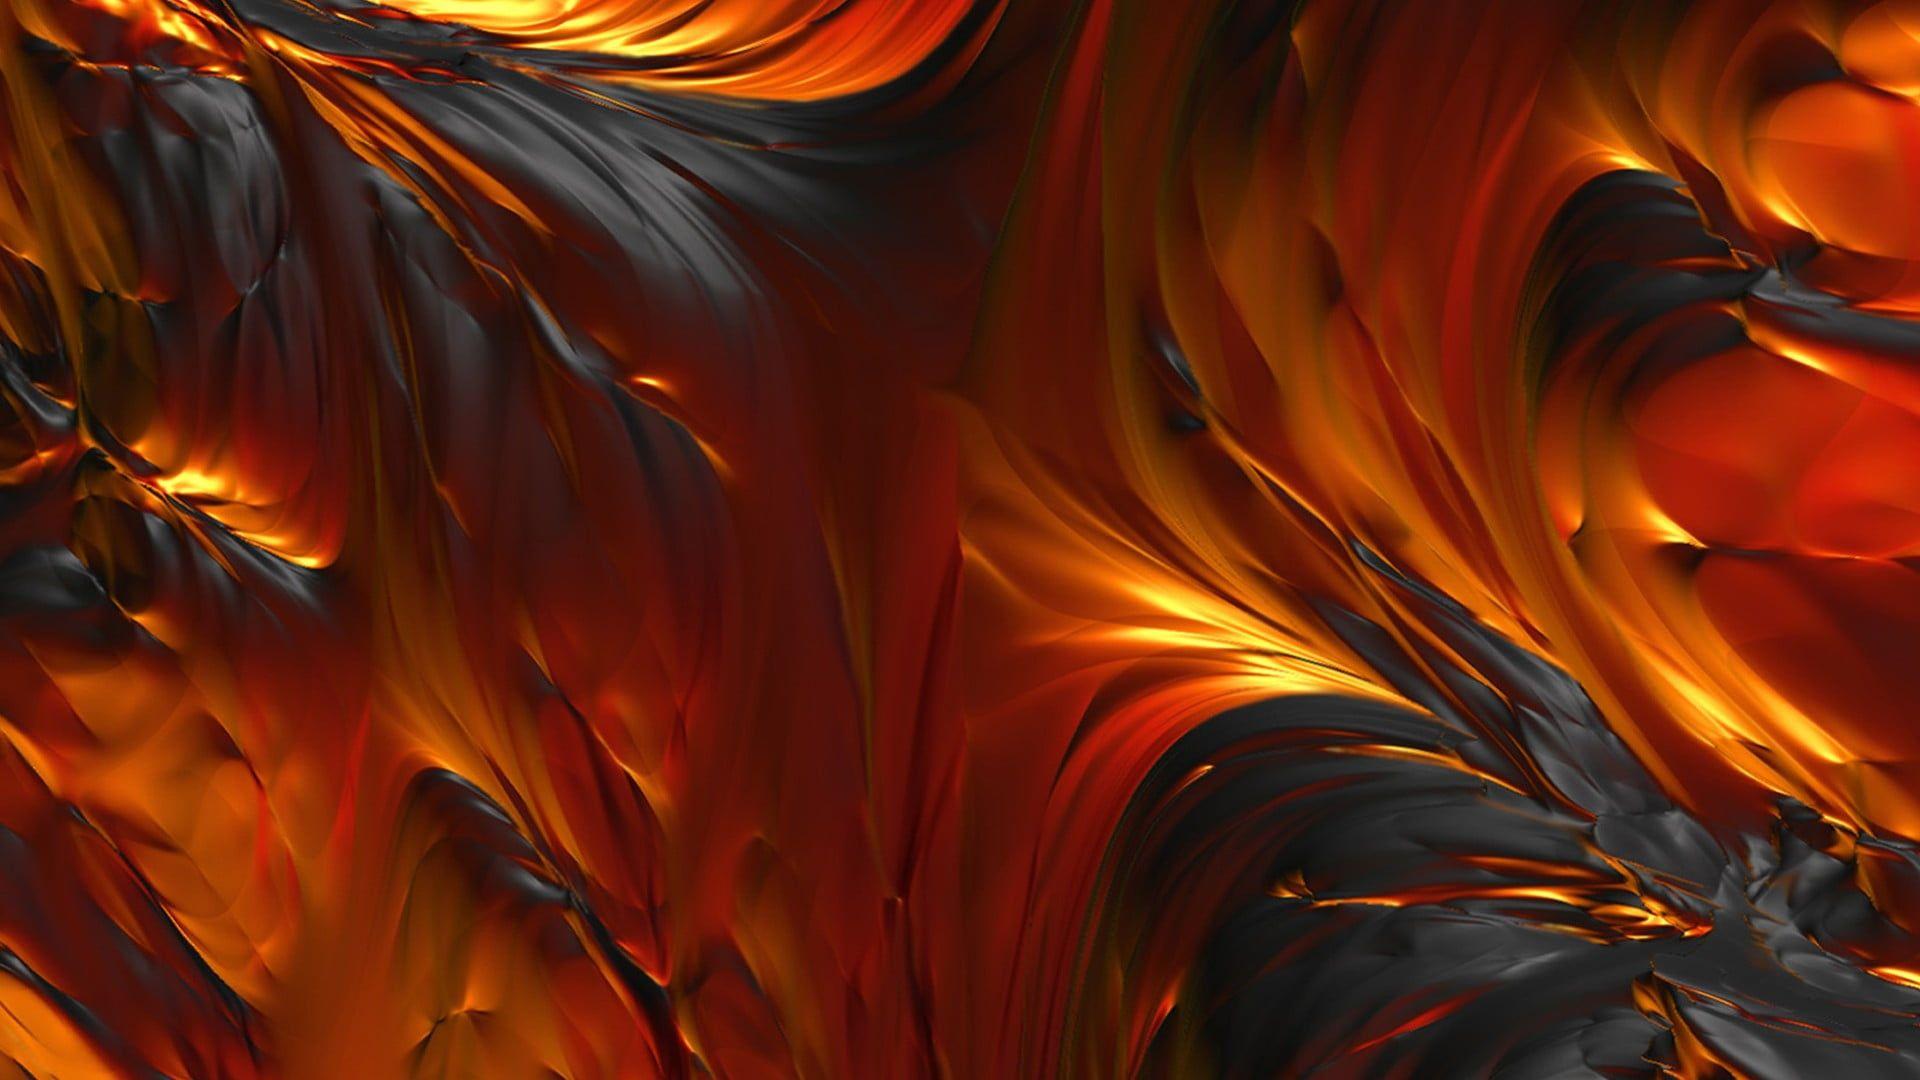 Red And Black Digital Wallpaper Digital Art Render Abstract Wallpaper Abstract Abstract Wallpaper Digital Wallpaper